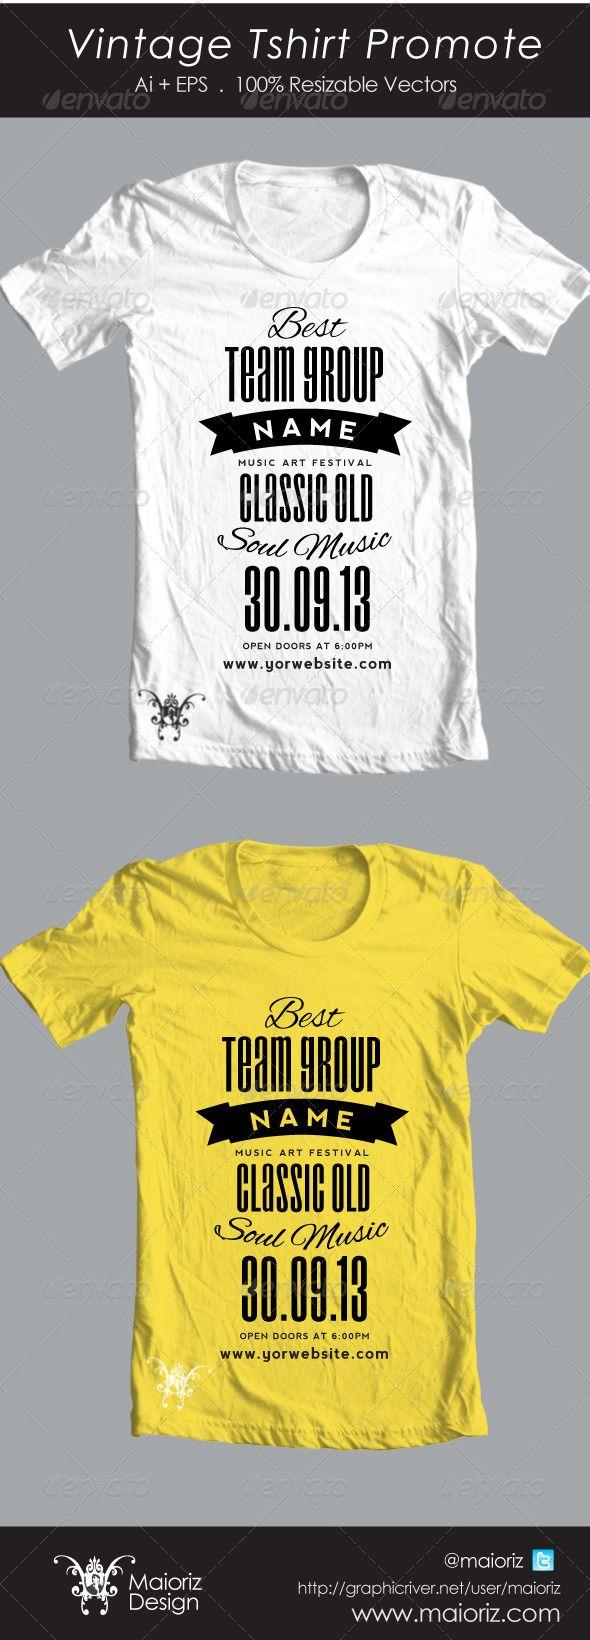 Shirt design template size - Vintage Promote Tshirt